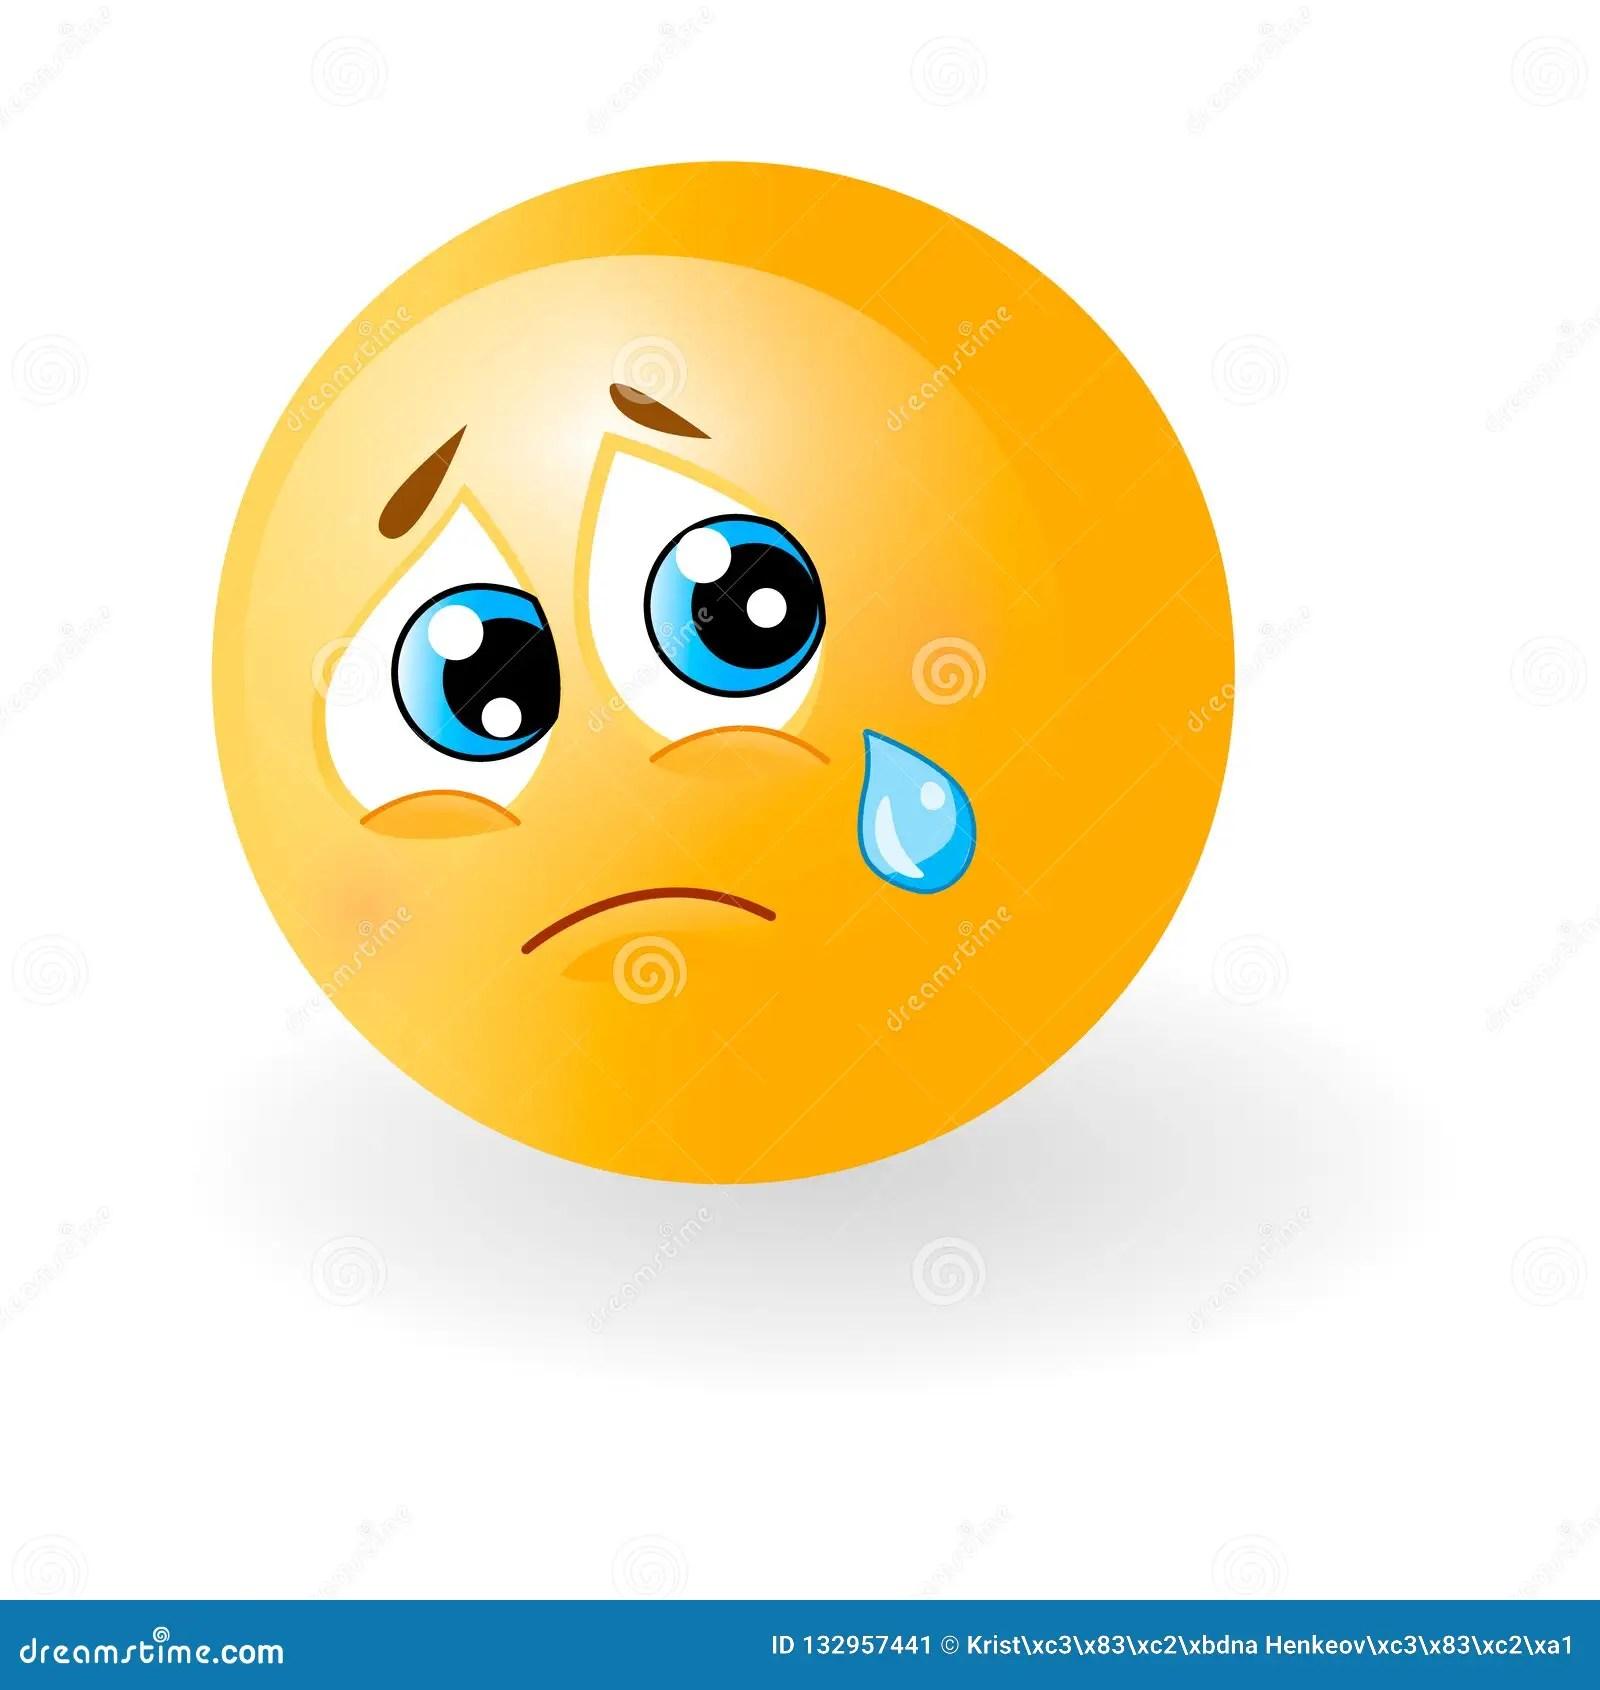 Cute Sad Face Emoji Stock Illustrations 13 970 Cute Sad Face Emoji Stock Illustrations Vectors Clipart Dreamstime